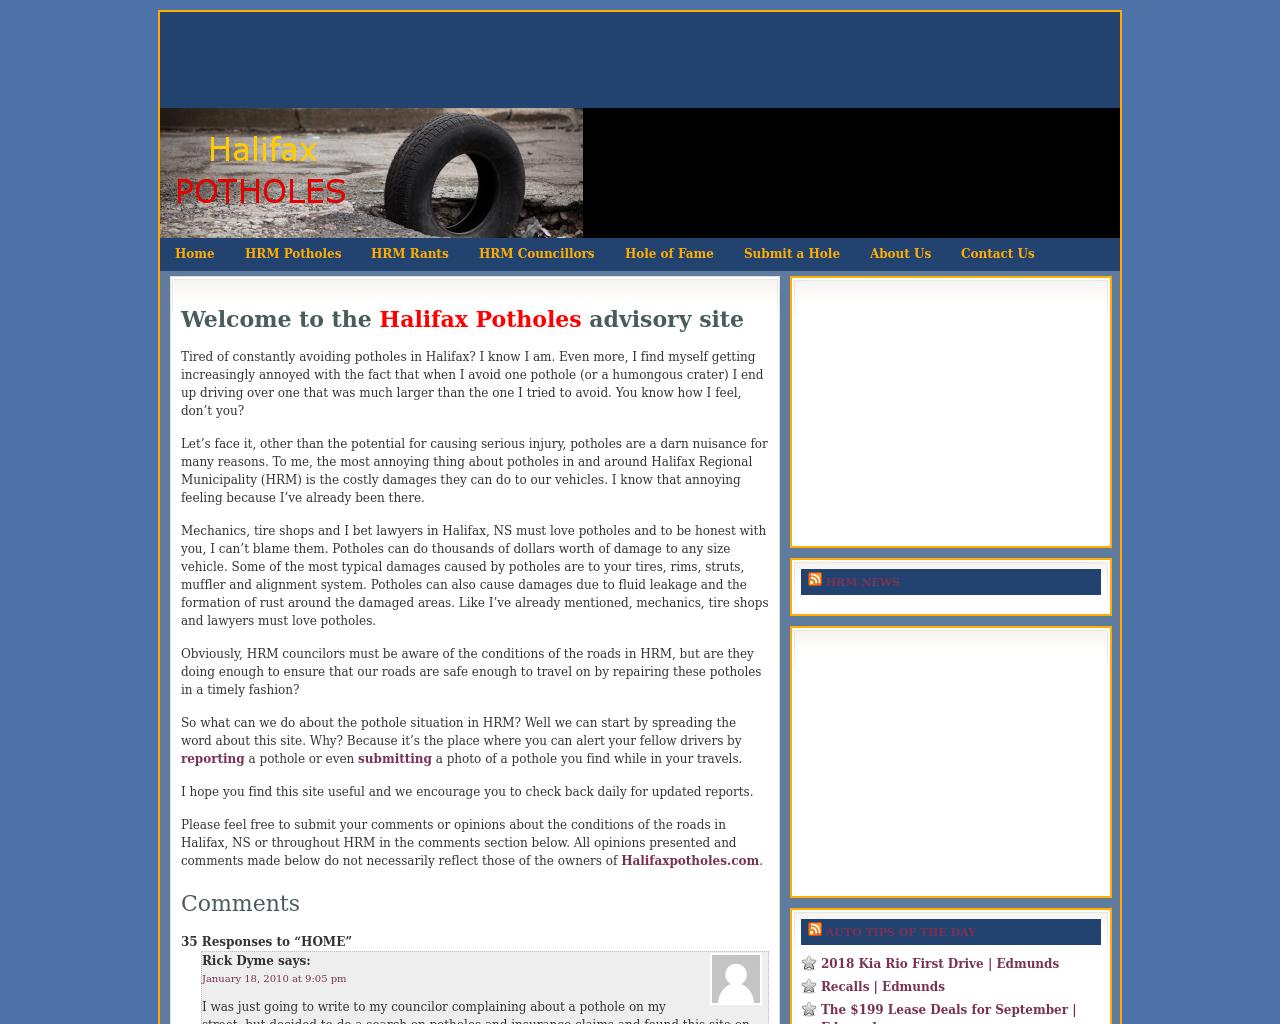 Halifax-Potholes-Advertising-Reviews-Pricing